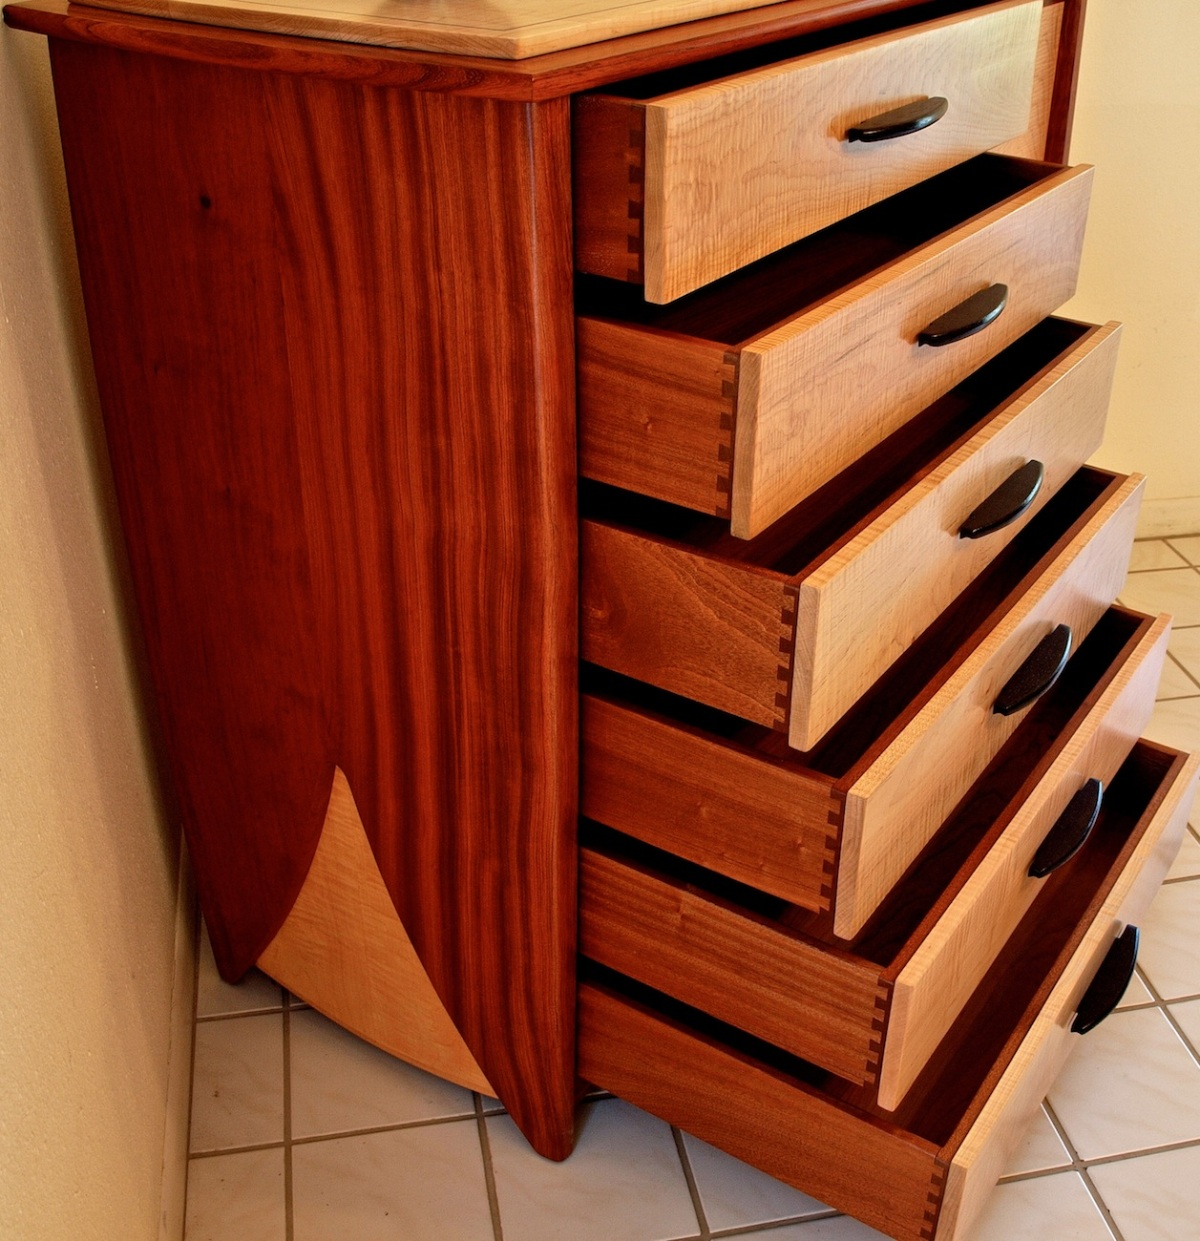 dovetailed drawer details